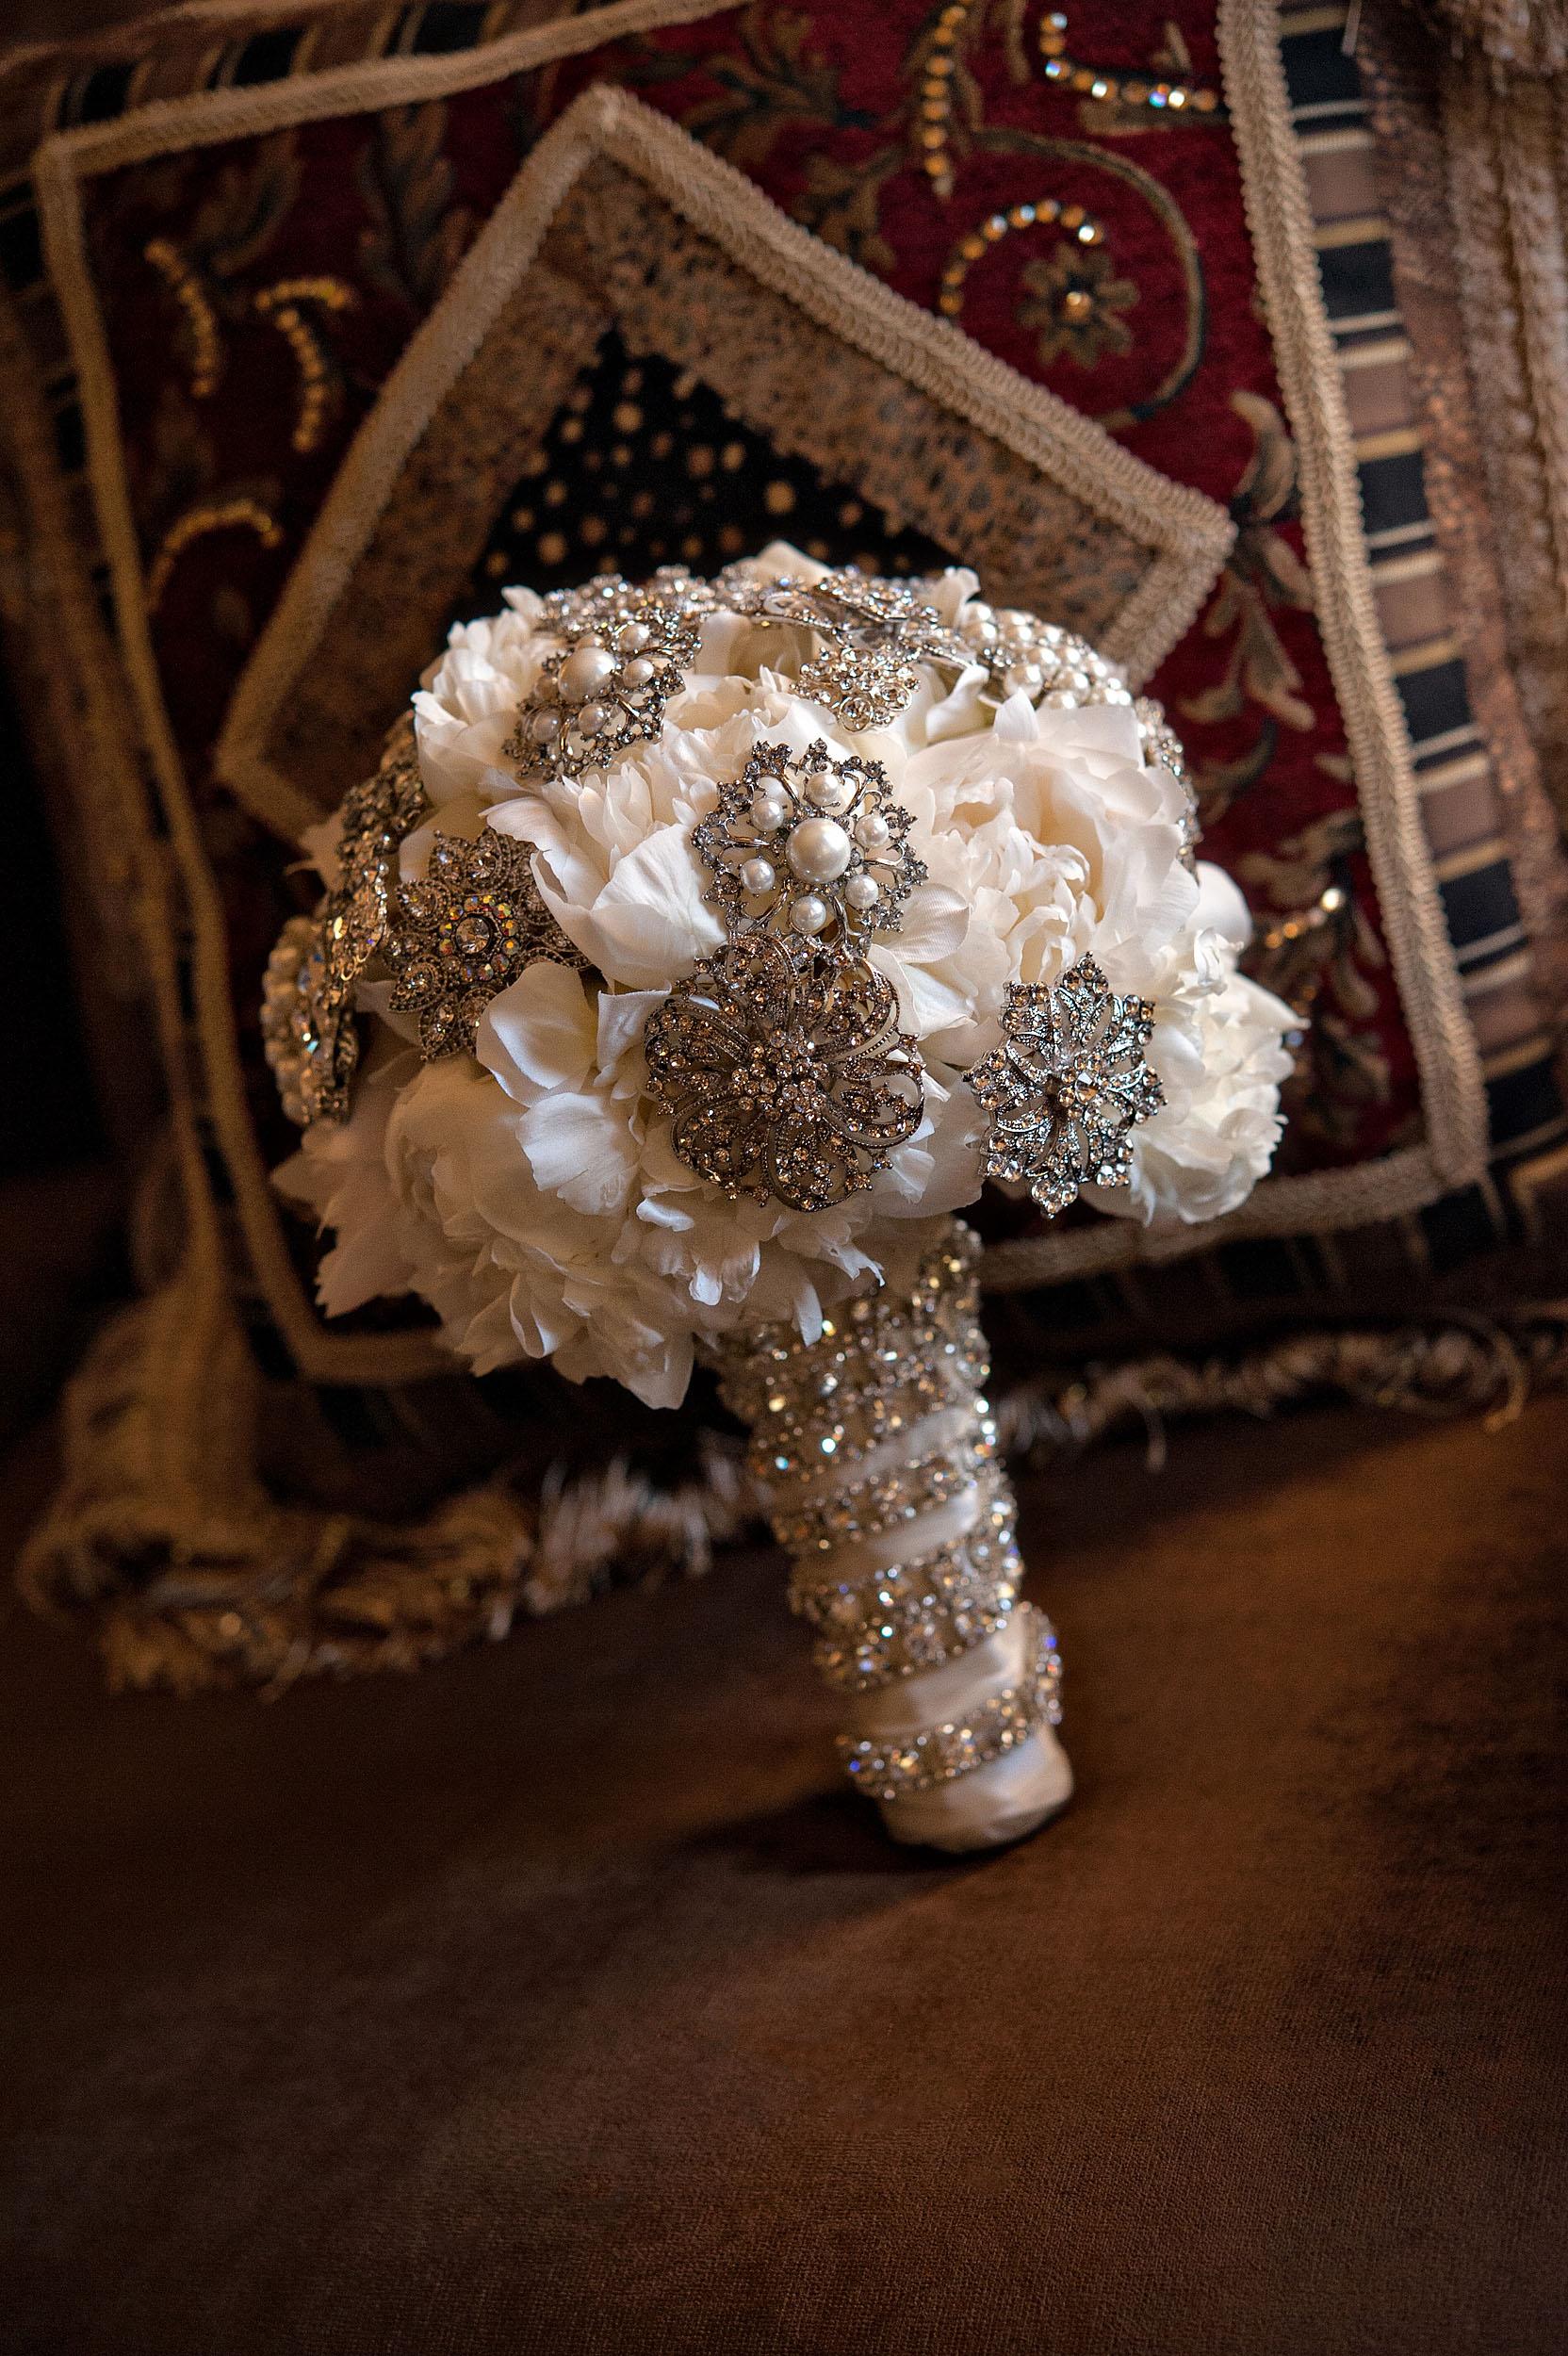 Bride's bejeweled bouquet.